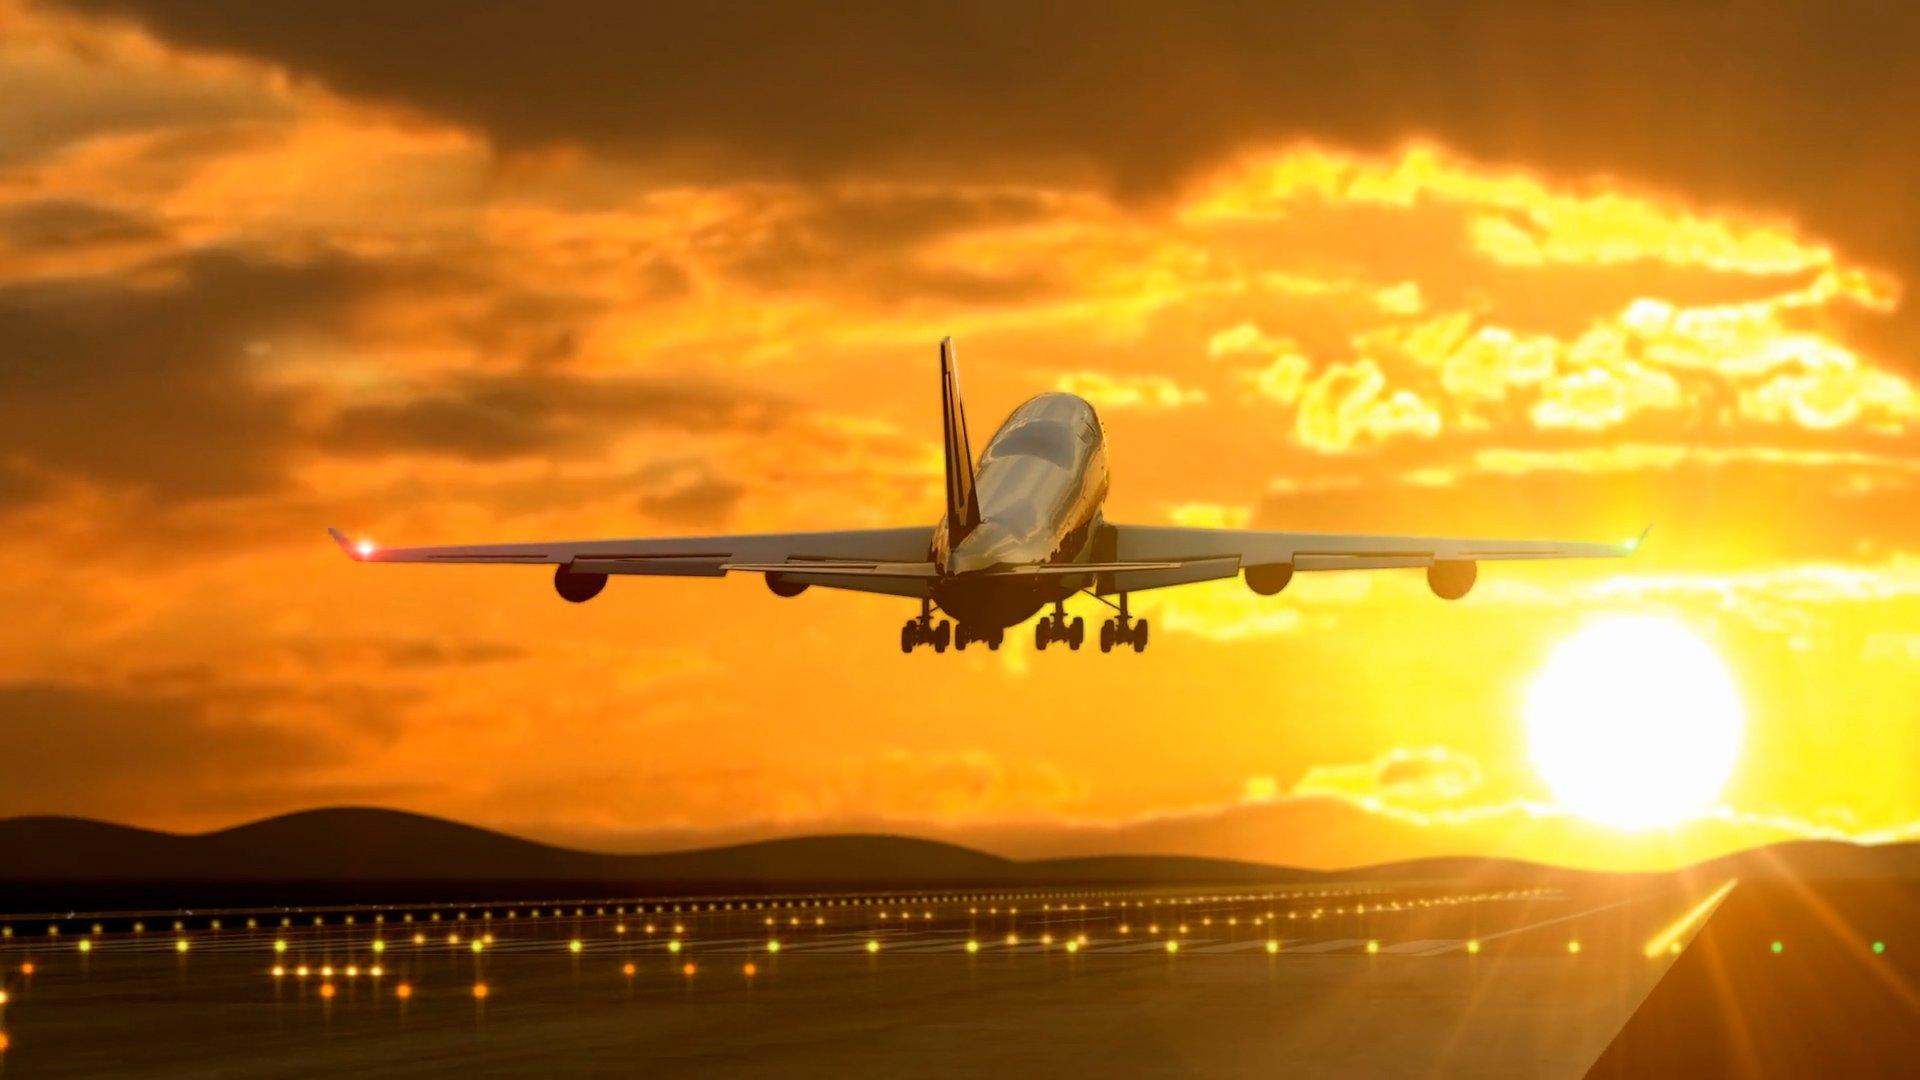 Plane taking off runway